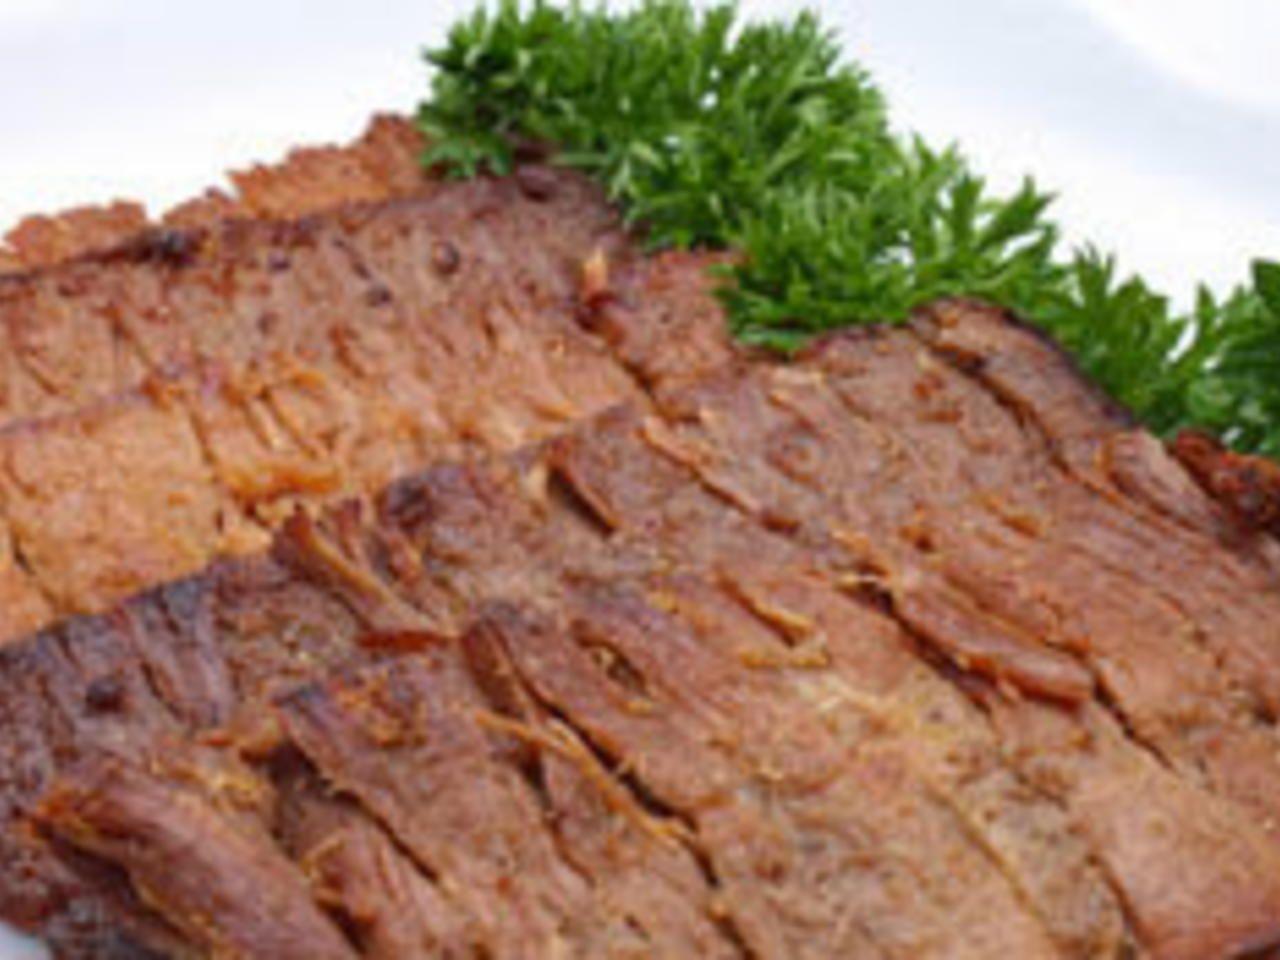 Resep Gepuk Sunda Daging Sapi Juna Oleh Resepjuna Blogspot Com Craftlog Resep Resep Masakan Indonesia Resep Masakan